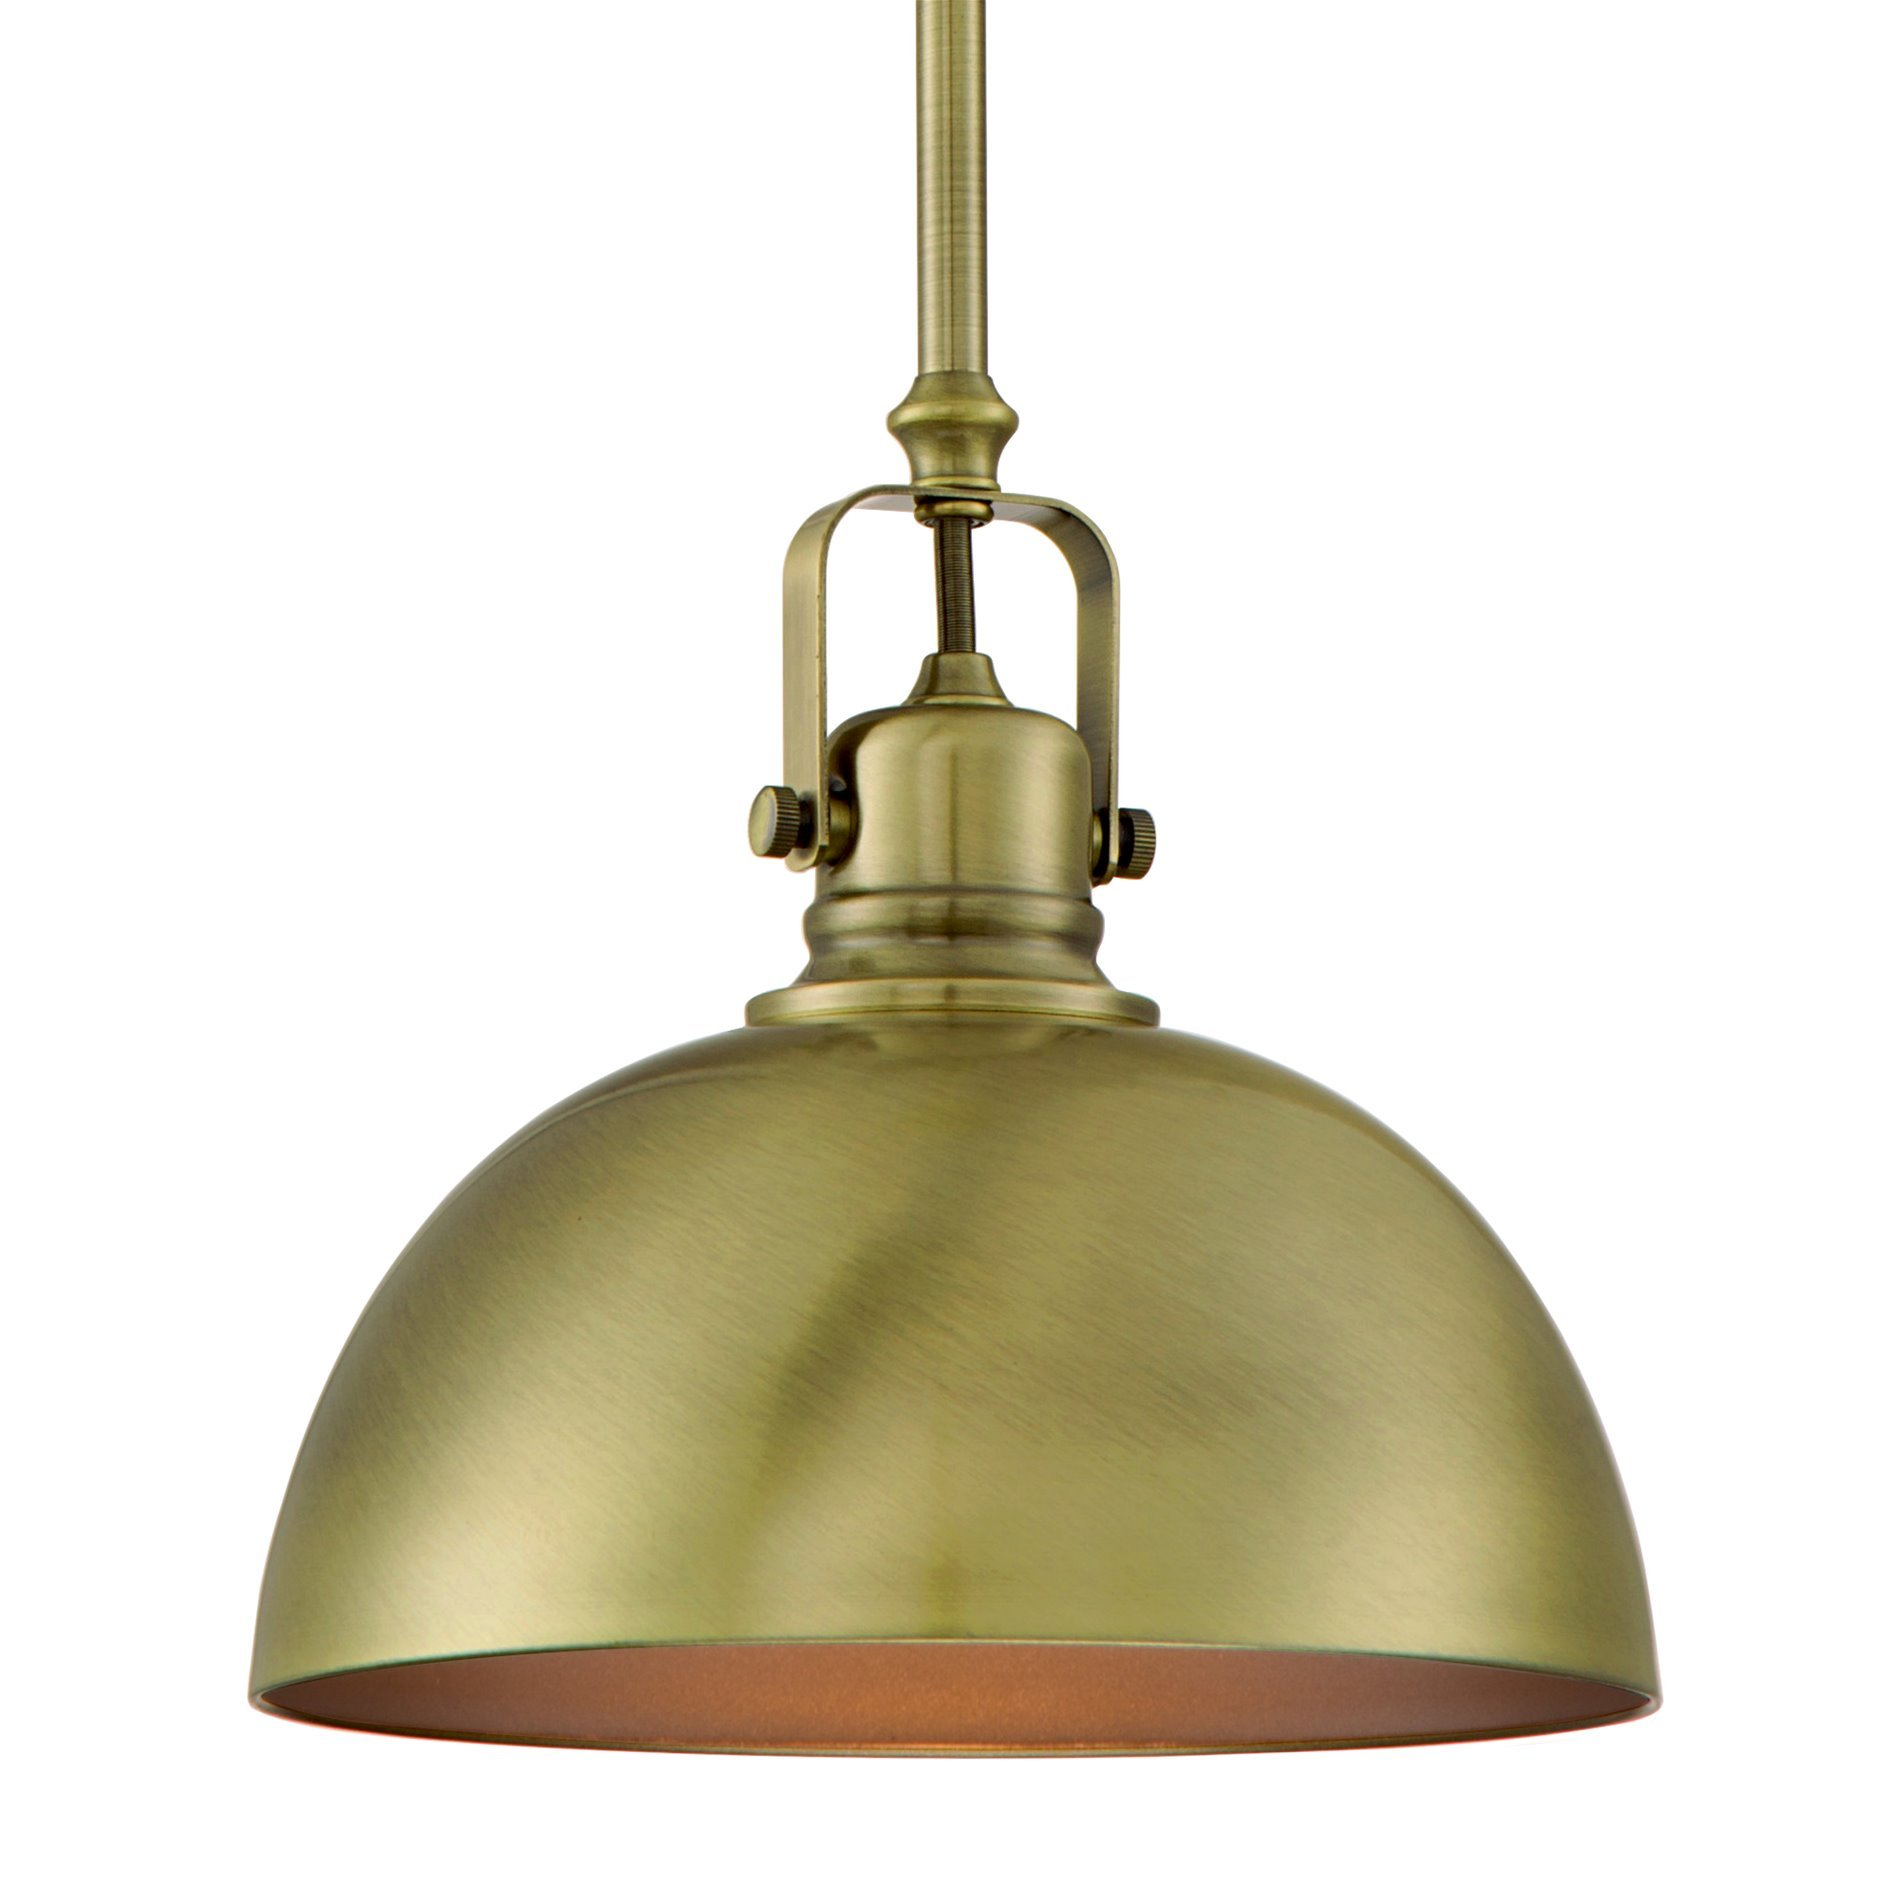 Kira Home Belle 9'' Contemporary Adjustable Pendant Light, Antique Brass Finish